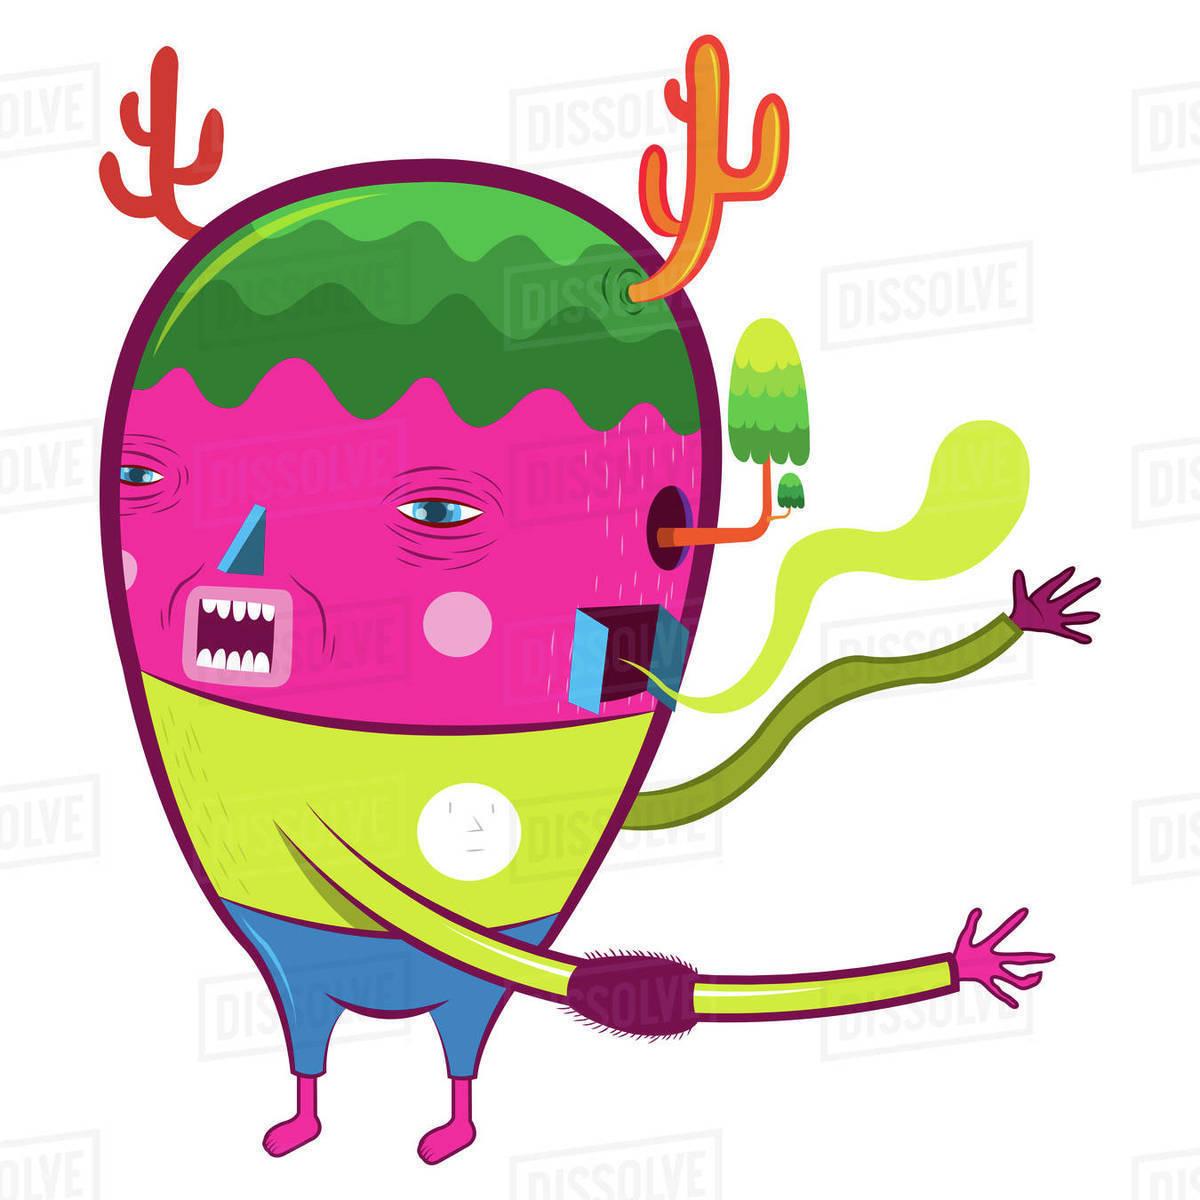 Cartoon Illustration Of Pink Tree Monster Against White Background Stock Photo Dissolve 3d cartoon dead tree monster created and rendered in blender. dissolve